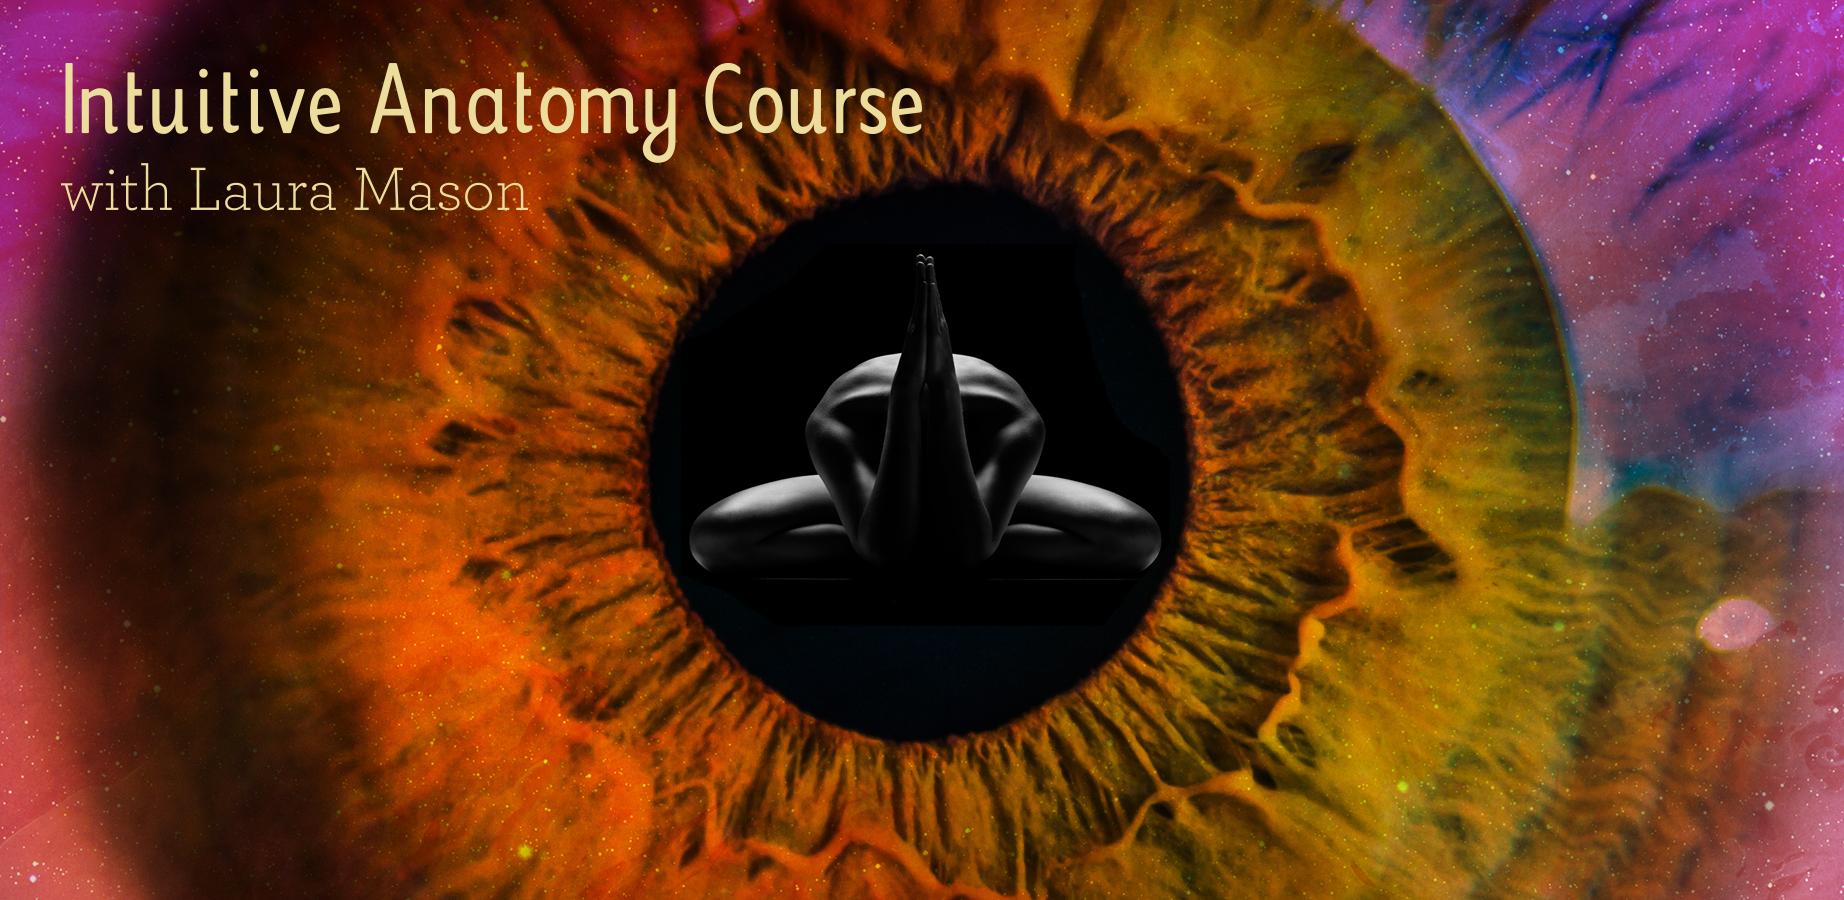 Laura Mason Web images-NEW Intuitive Anatomy .jpg